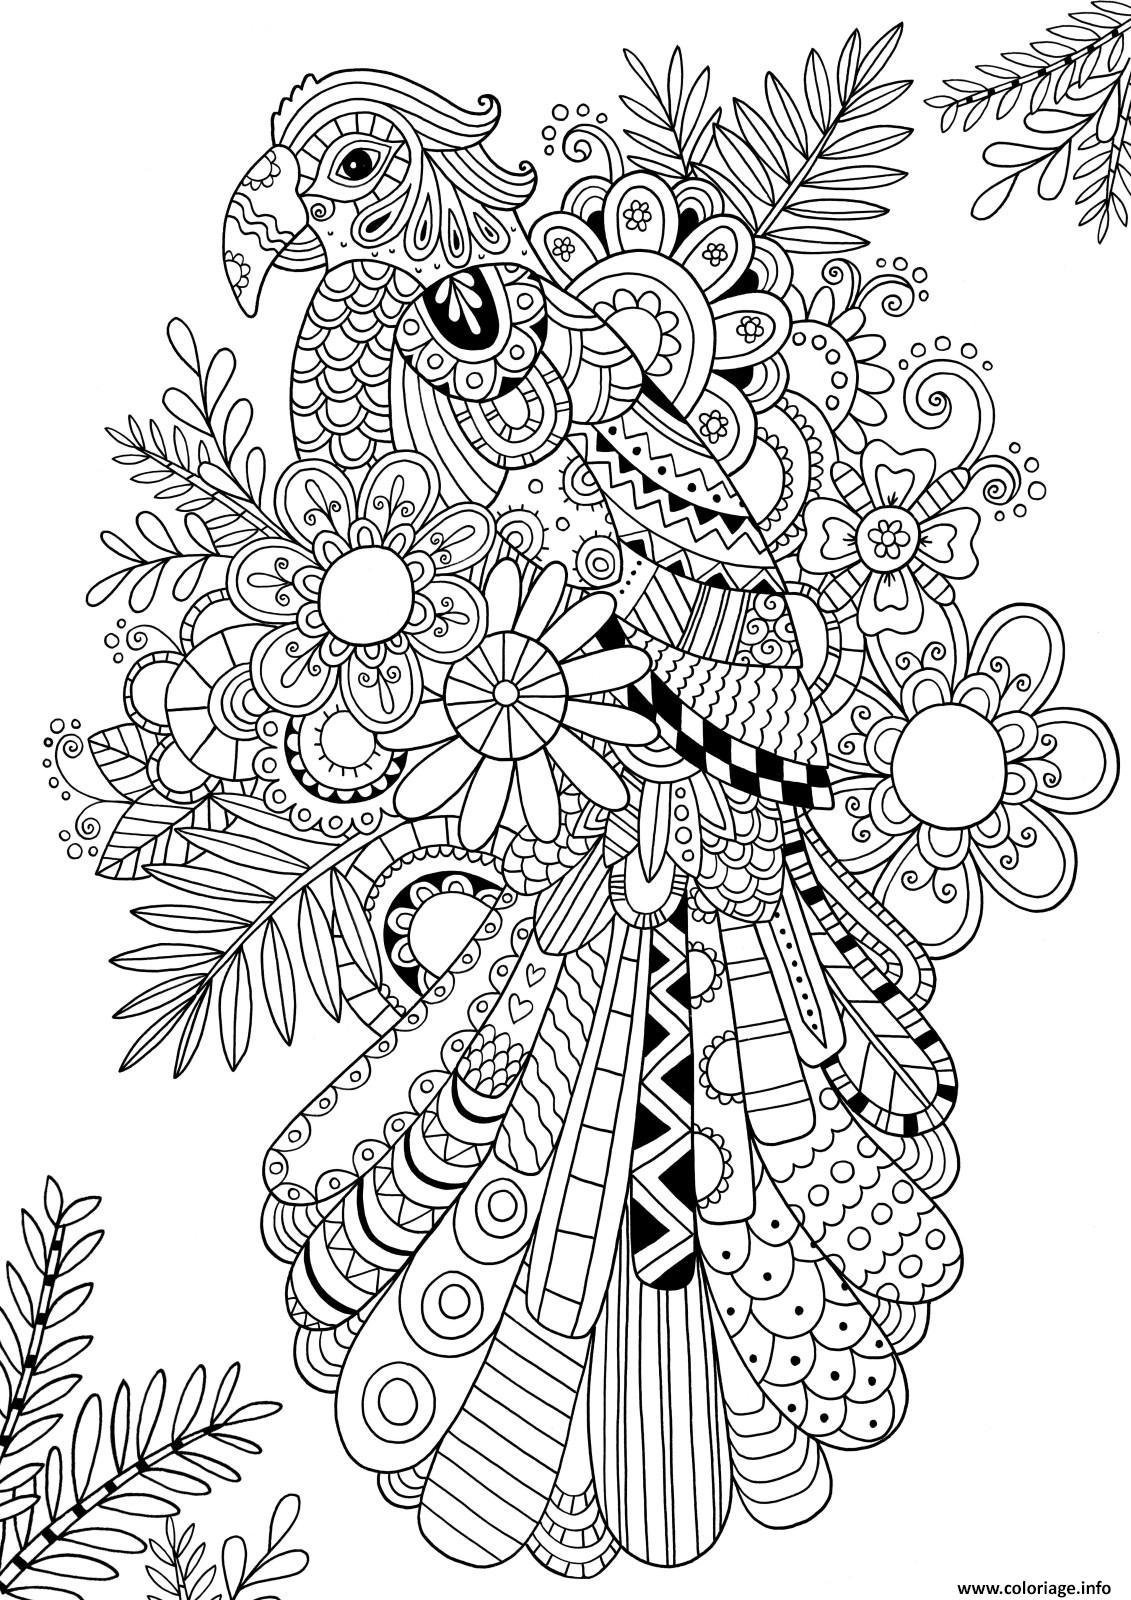 Coloriage Anti Stress Perroquet.Coloriage Zentangle Perroquet Oiseau Adulte Dessin